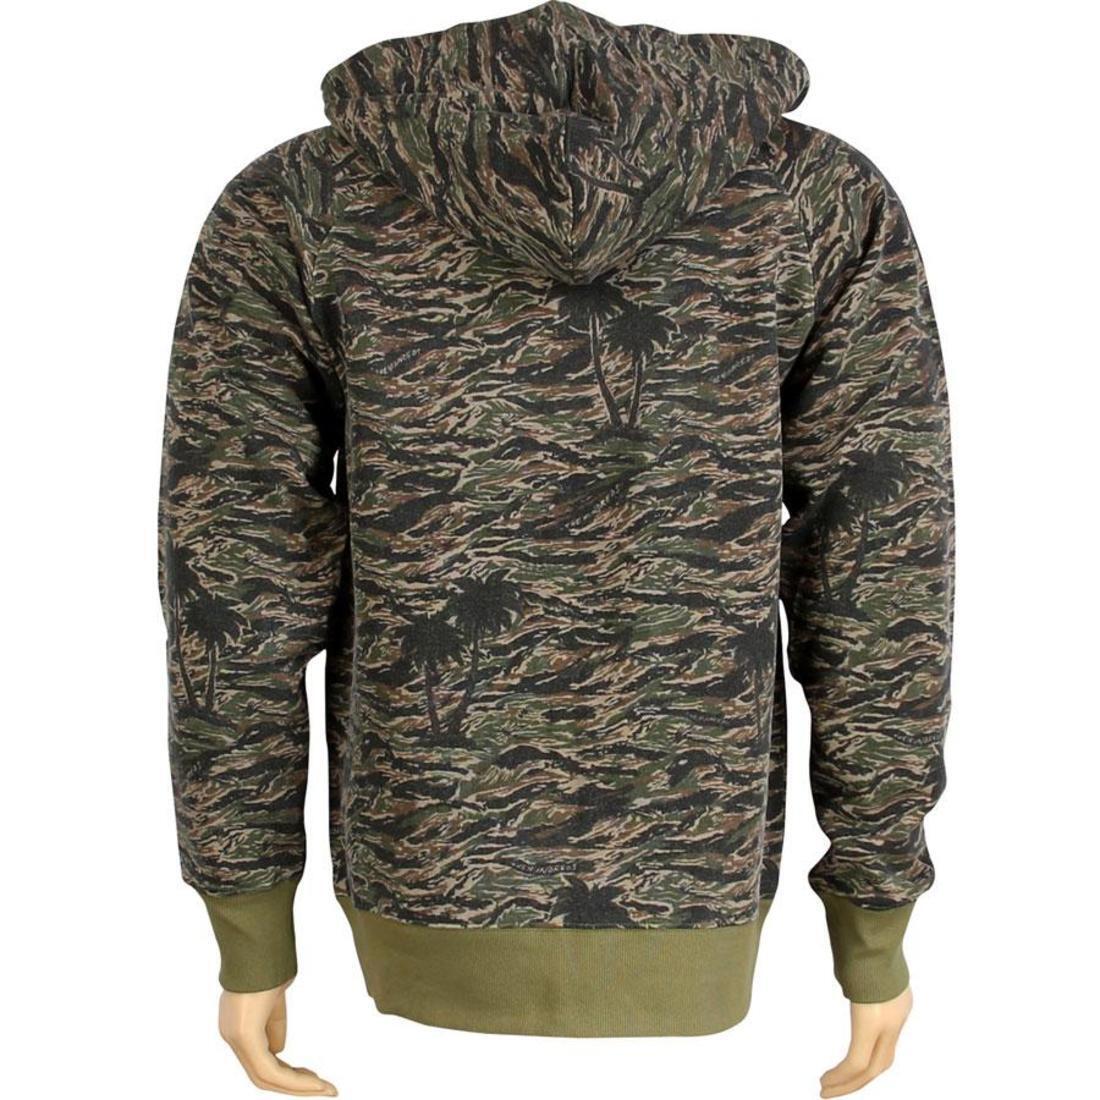 88.99 The Hundrossos Camo Zip Hoody THSP1112039WLD (woodland) THSP1112039WLD Hoody d27ad8